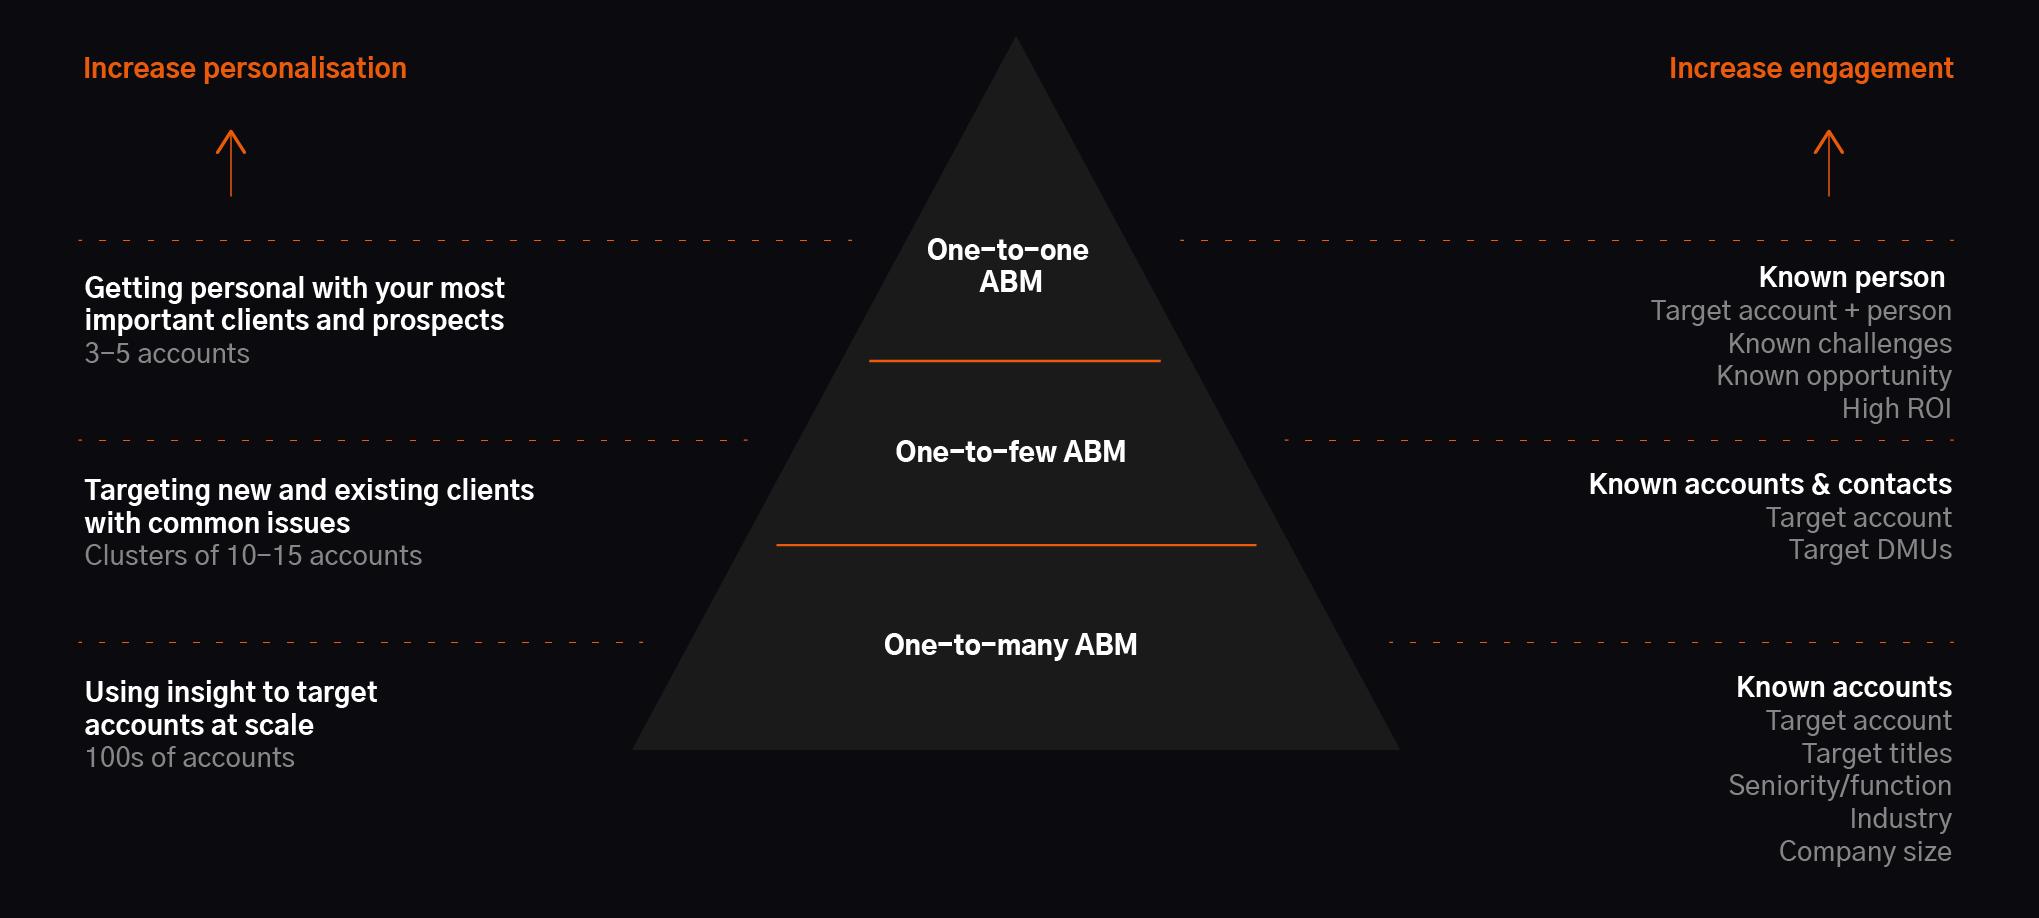 3 ABM programs